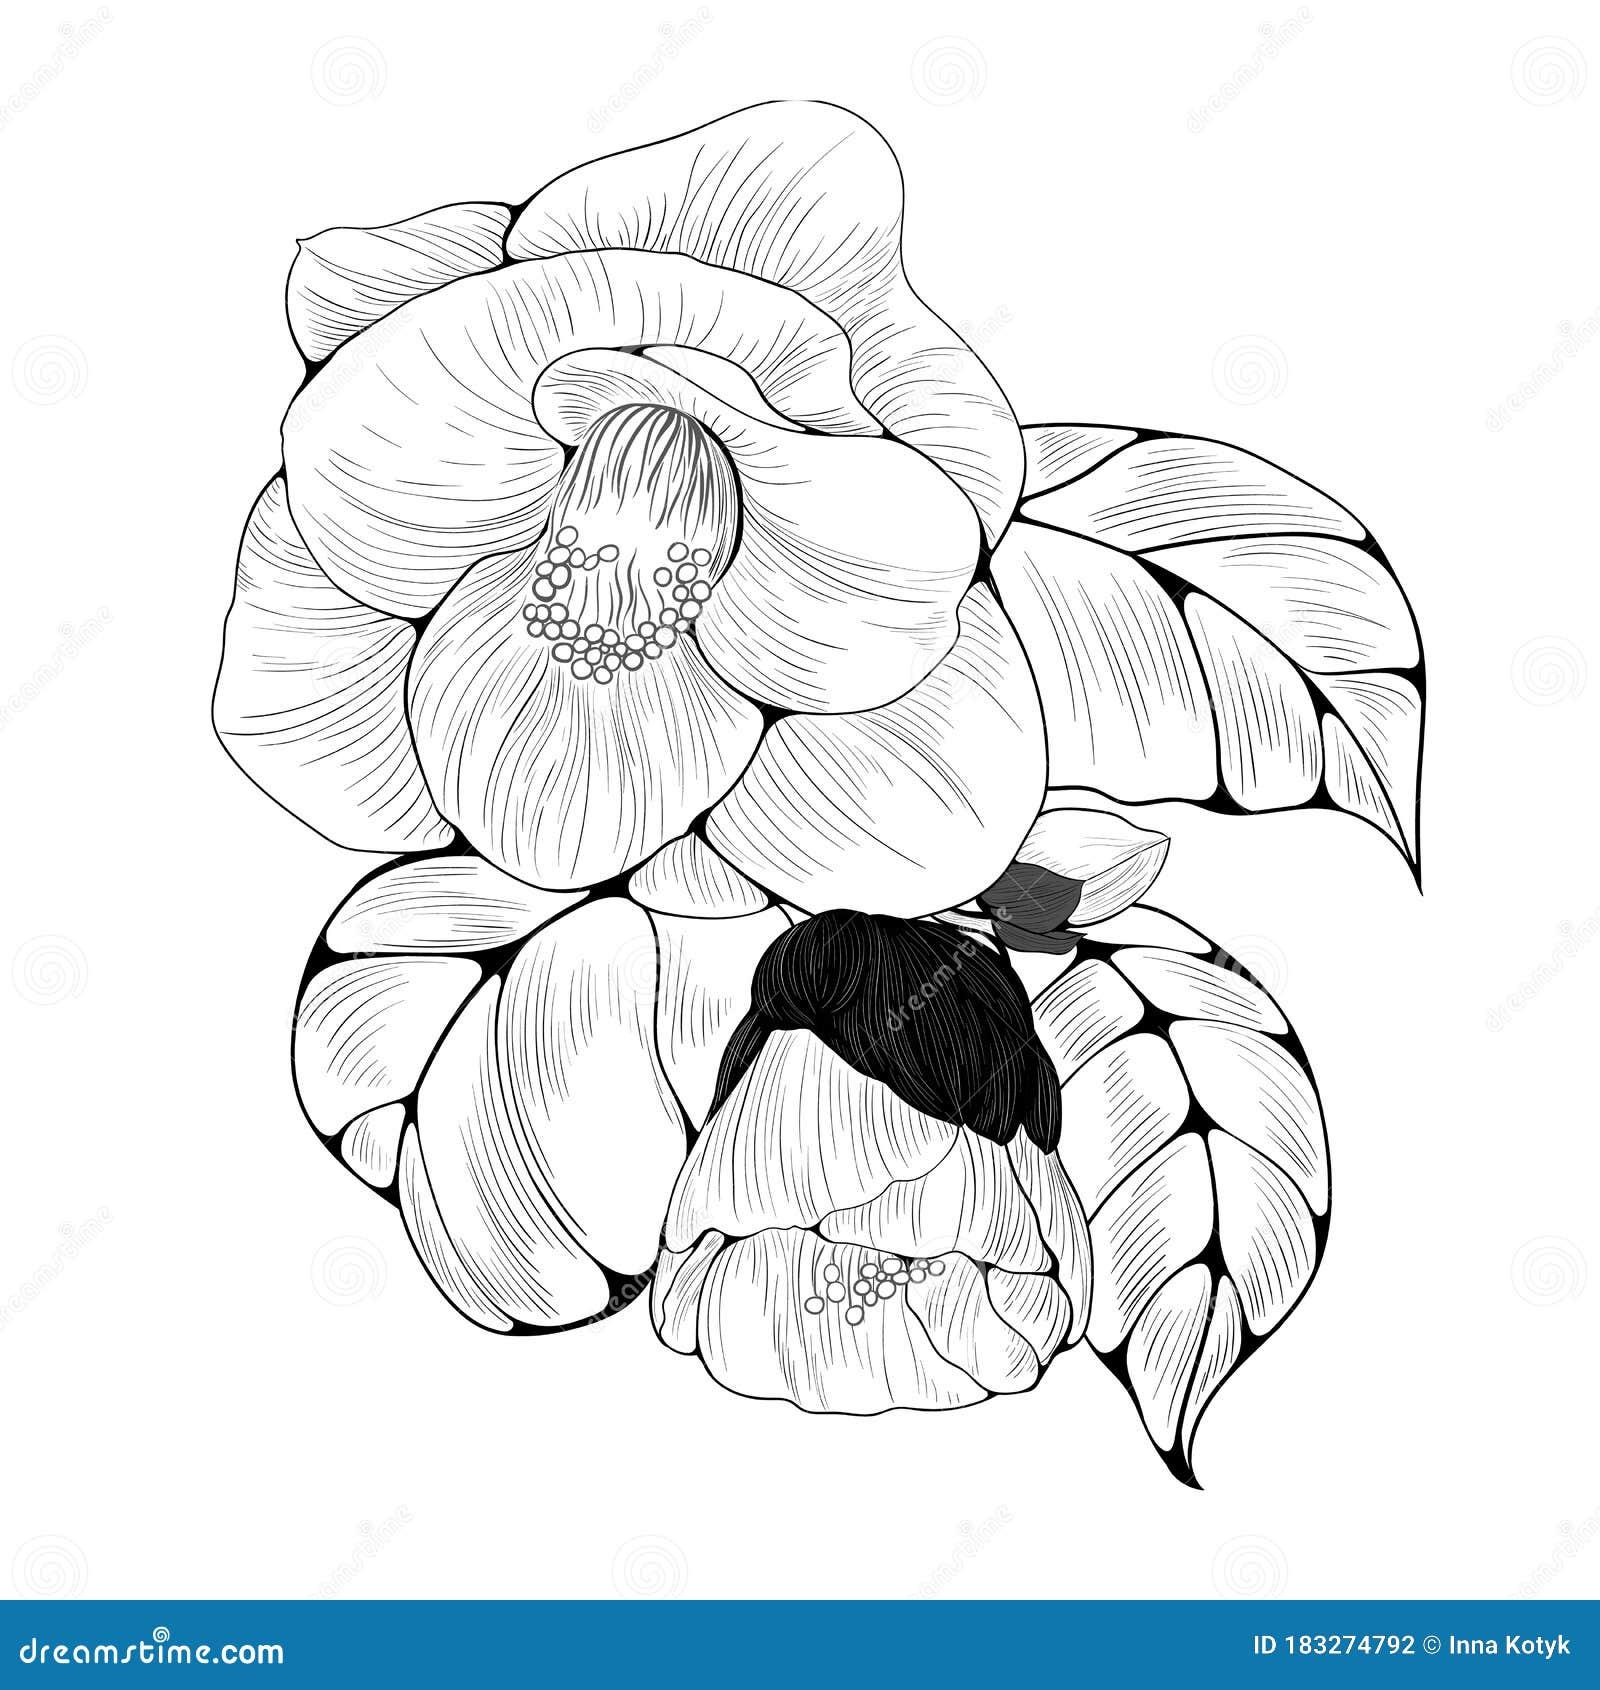 Plants Wallpaper Stock Illustrations 59 335 Plants Wallpaper Stock Illustrations Vectors Clipart Dreamstime